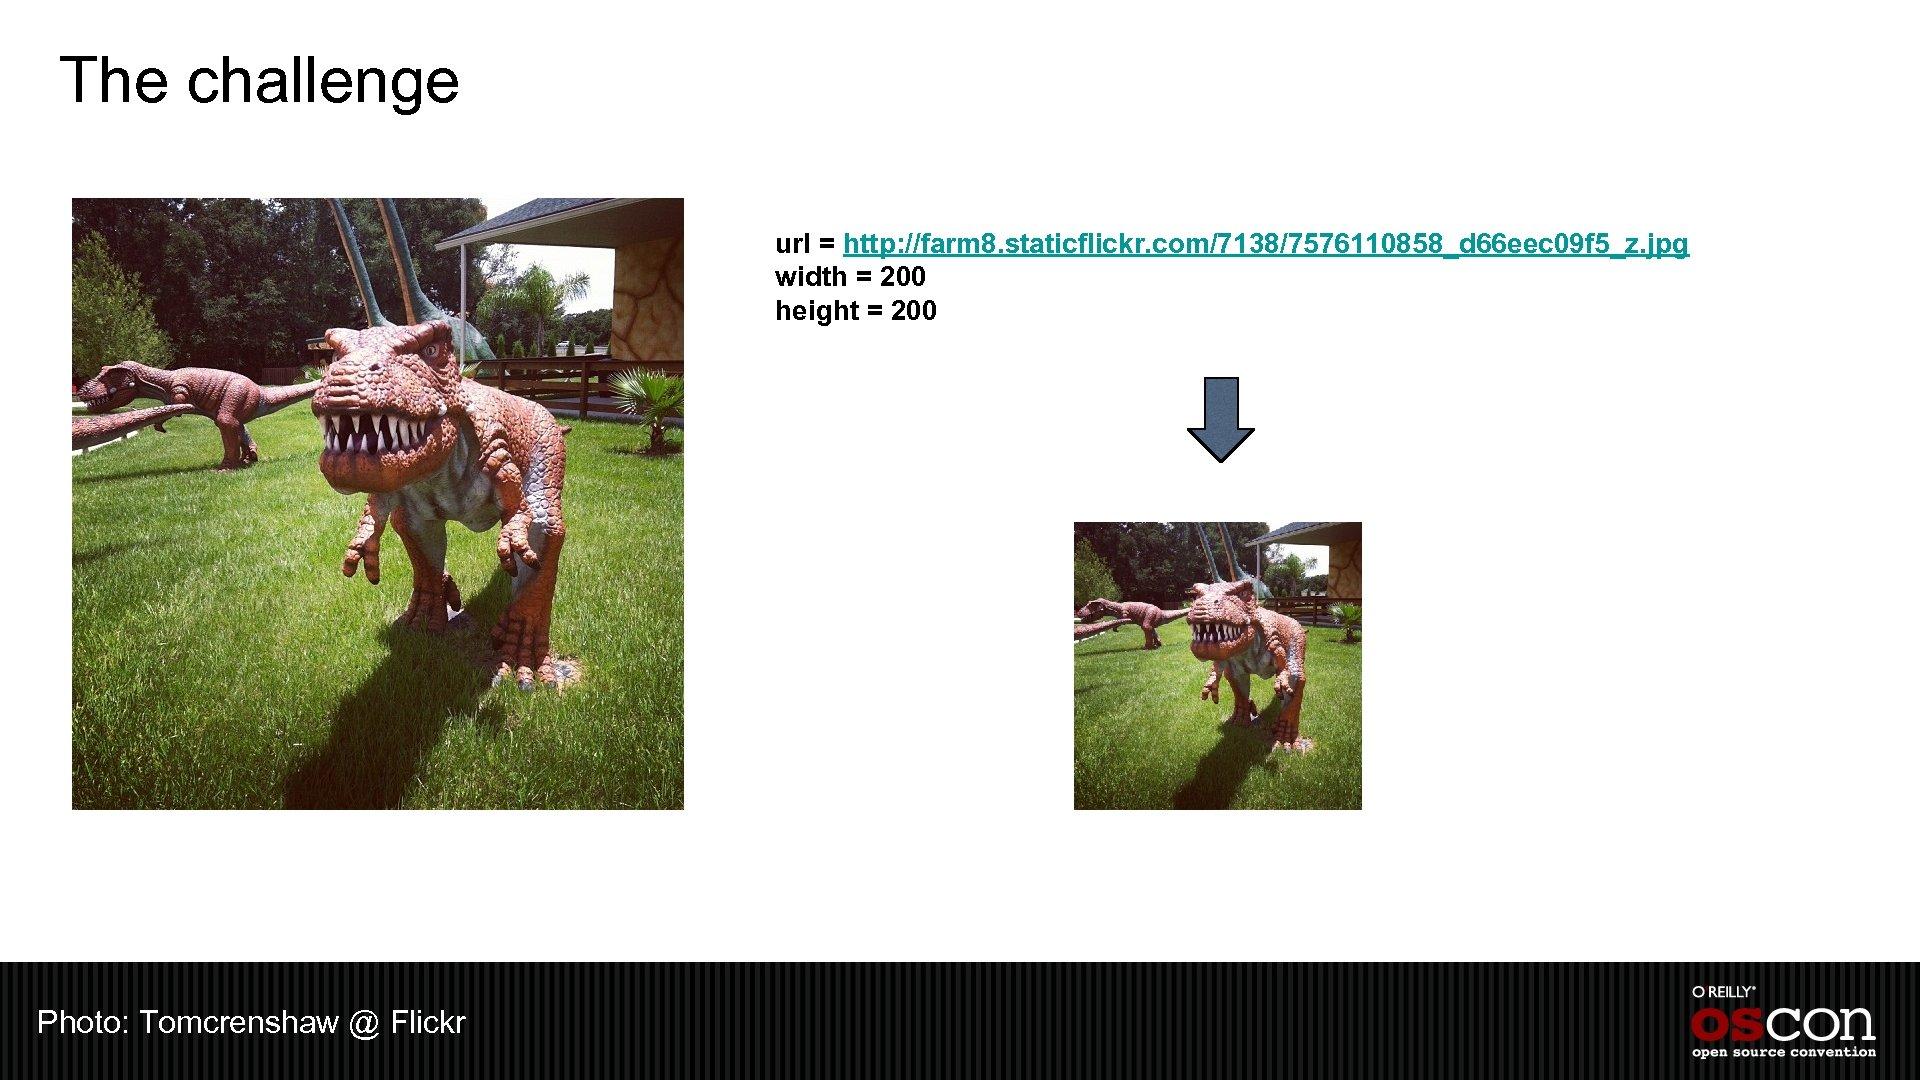 The challenge url = http: //farm 8. staticflickr. com/7138/7576110858_d 66 eec 09 f 5_z.